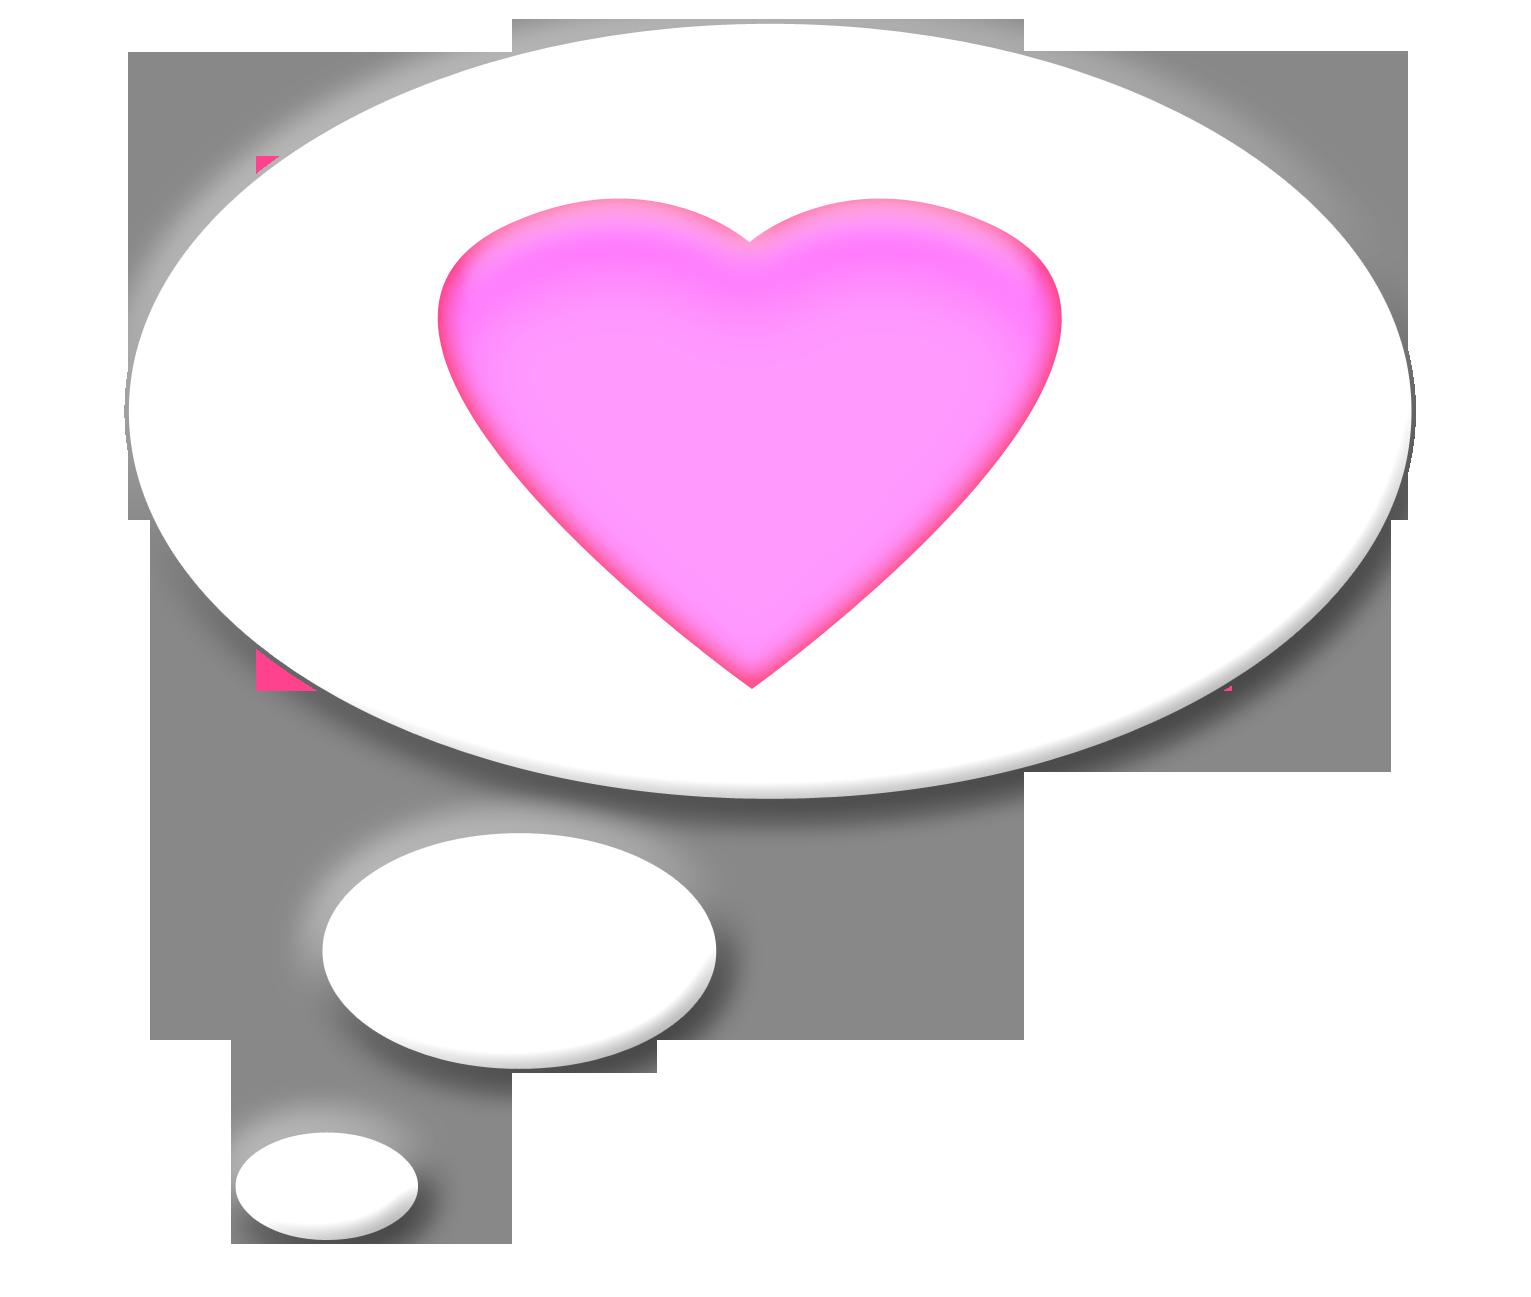 One heart clipart banner transparent download Talk Bubble Heart Clipart - Karen Cookie Jar banner transparent download